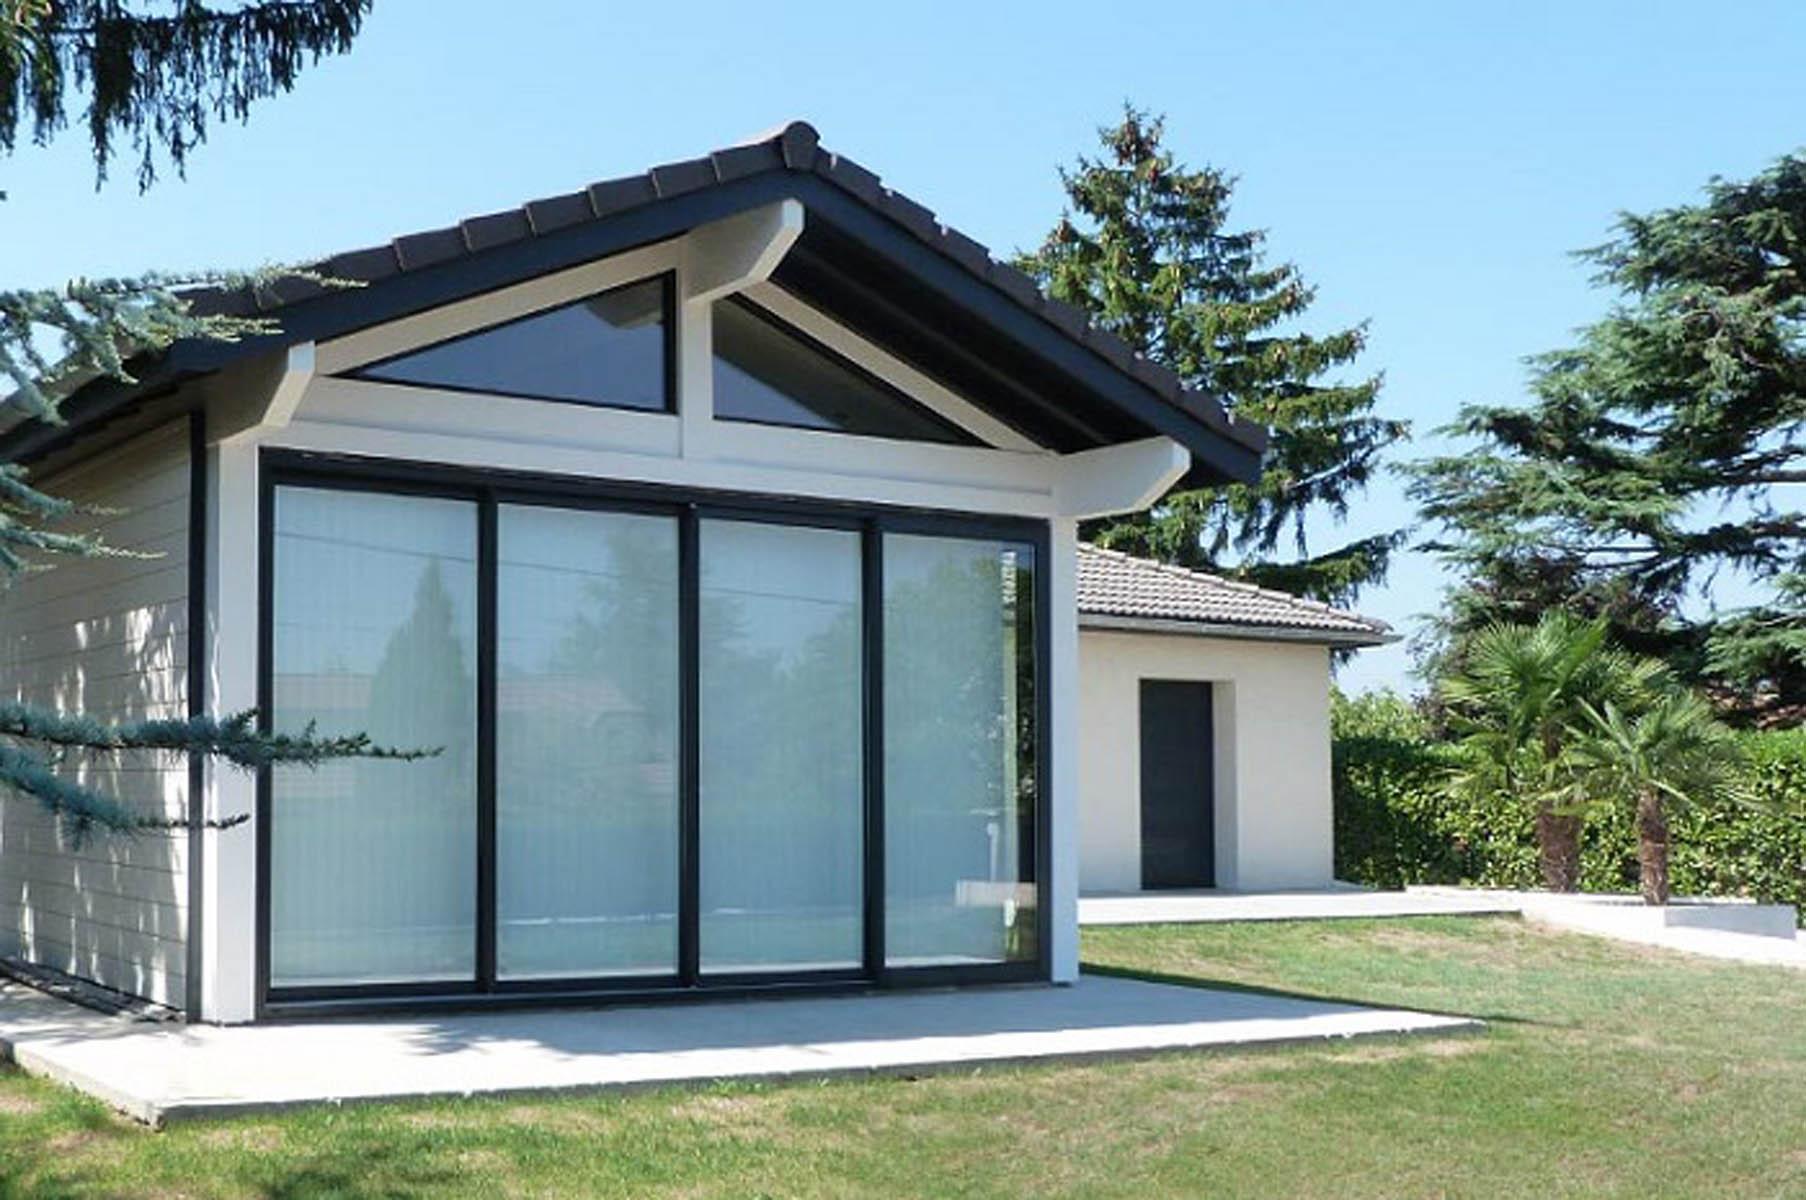 construire un pool house interesting construire un garage de m chalet amp cie gt pool house en. Black Bedroom Furniture Sets. Home Design Ideas